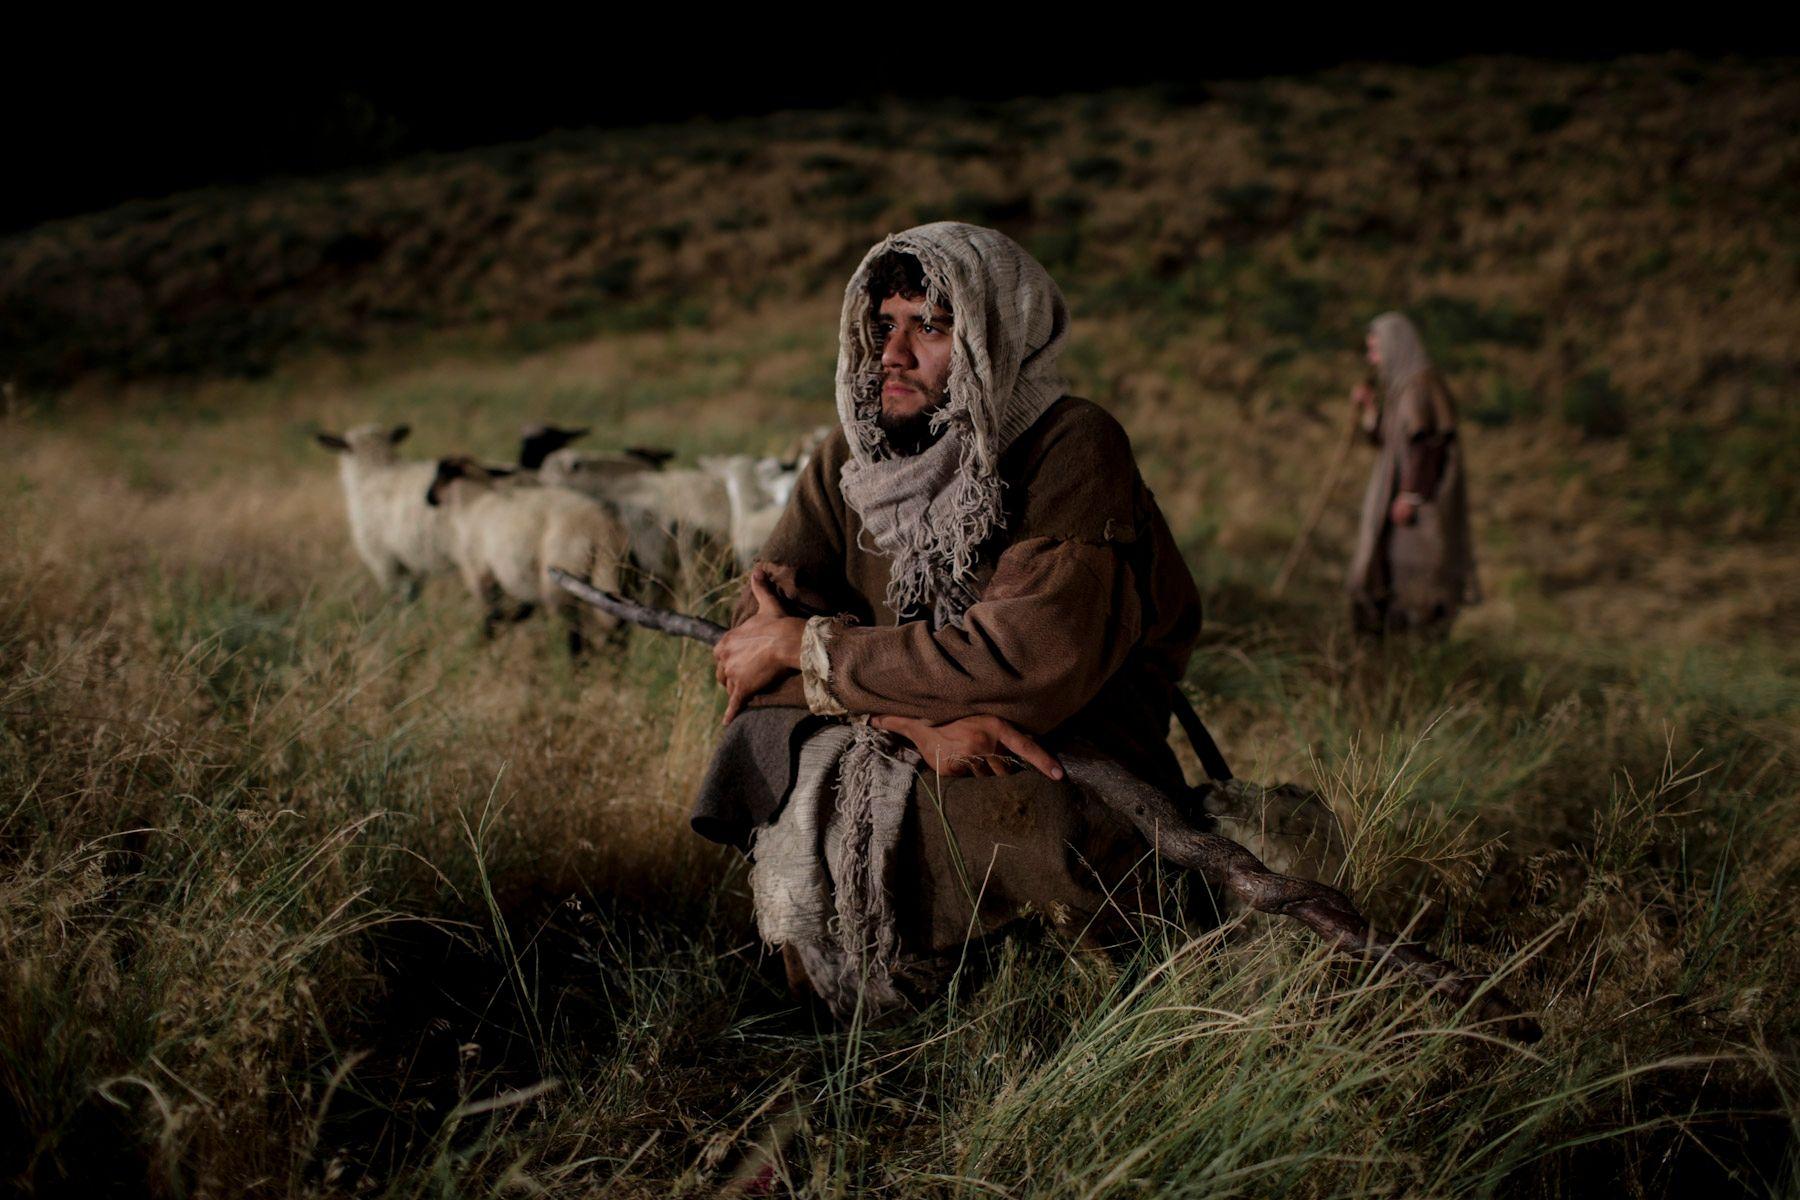 Shepherds watch their flocks at night.